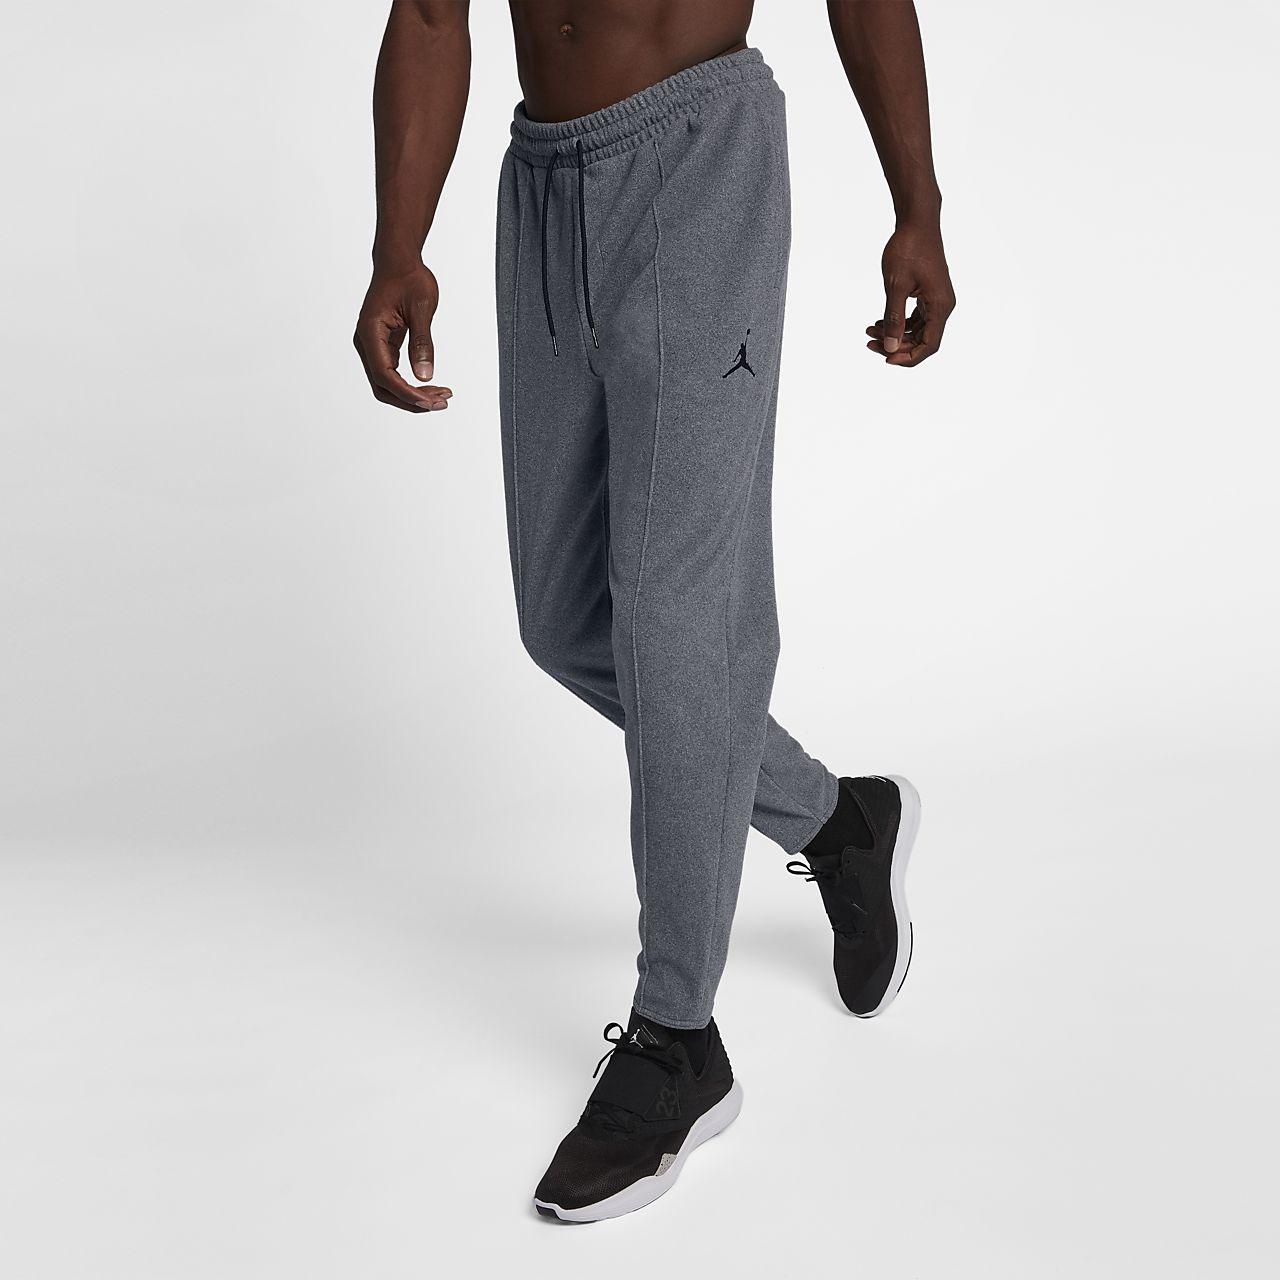 Jordan Therma 23 Alpha Men's Training Trousers